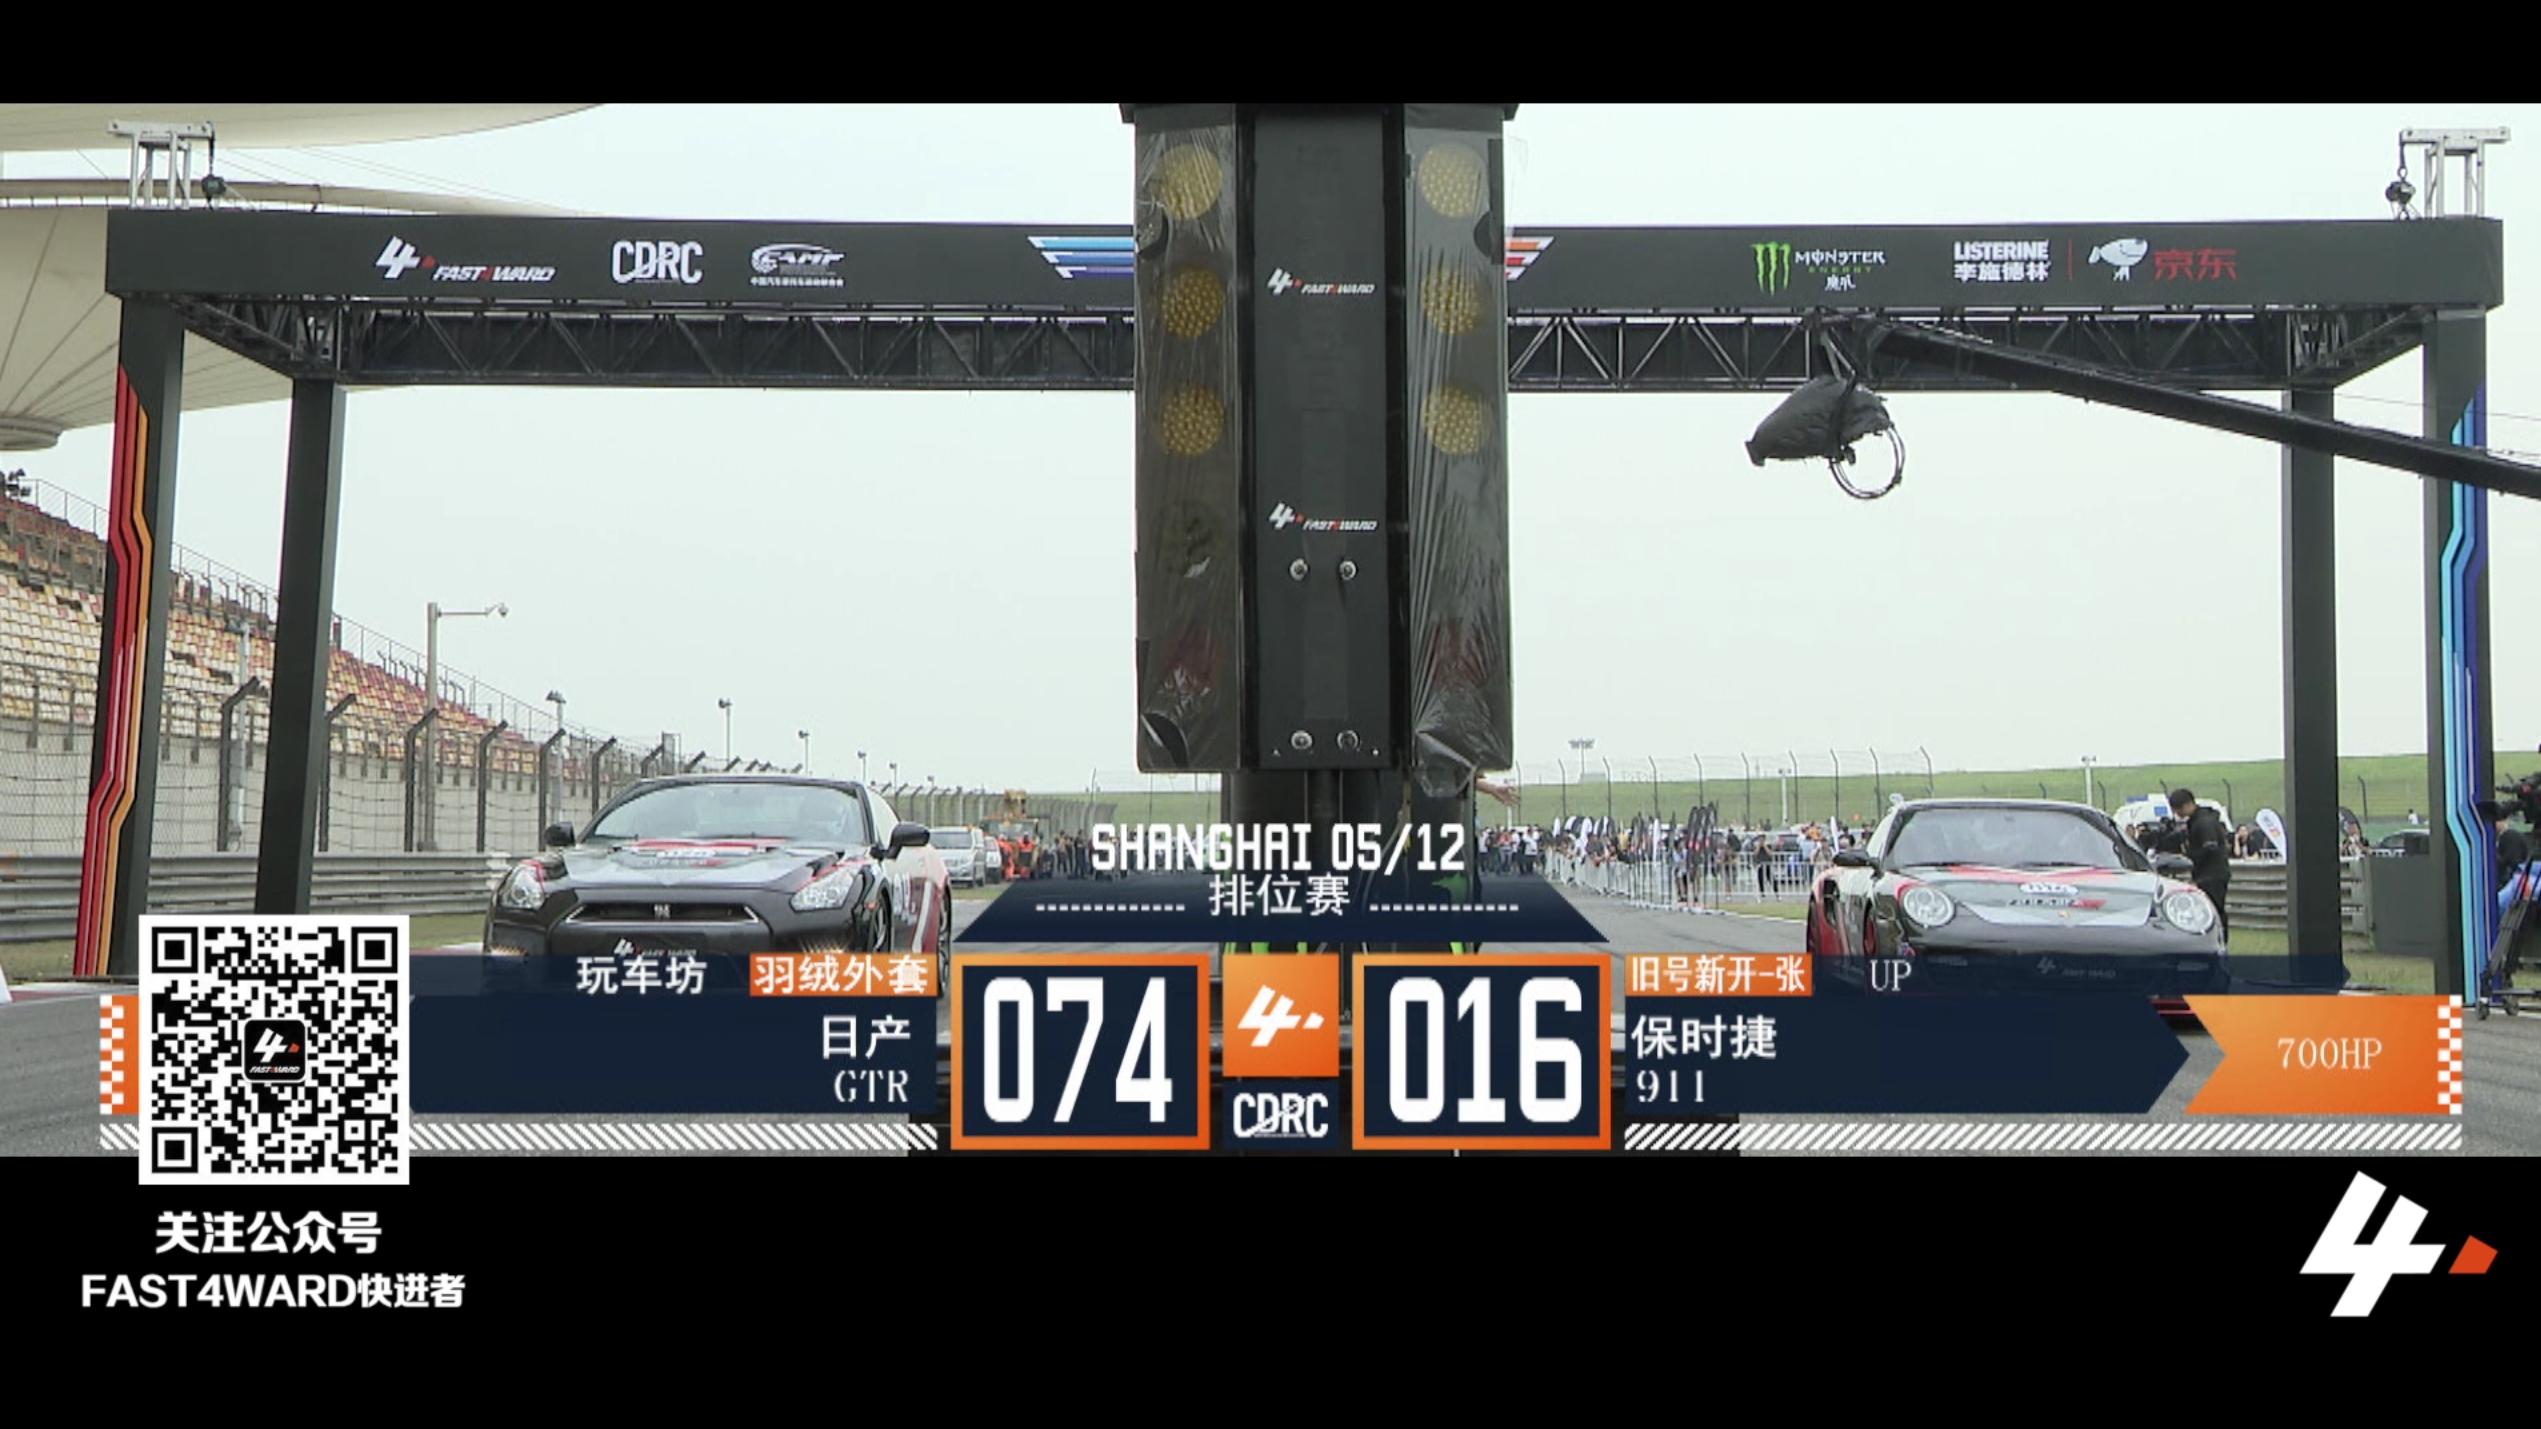 FAST4WARD 上海站 日产gtr vs 保时捷911